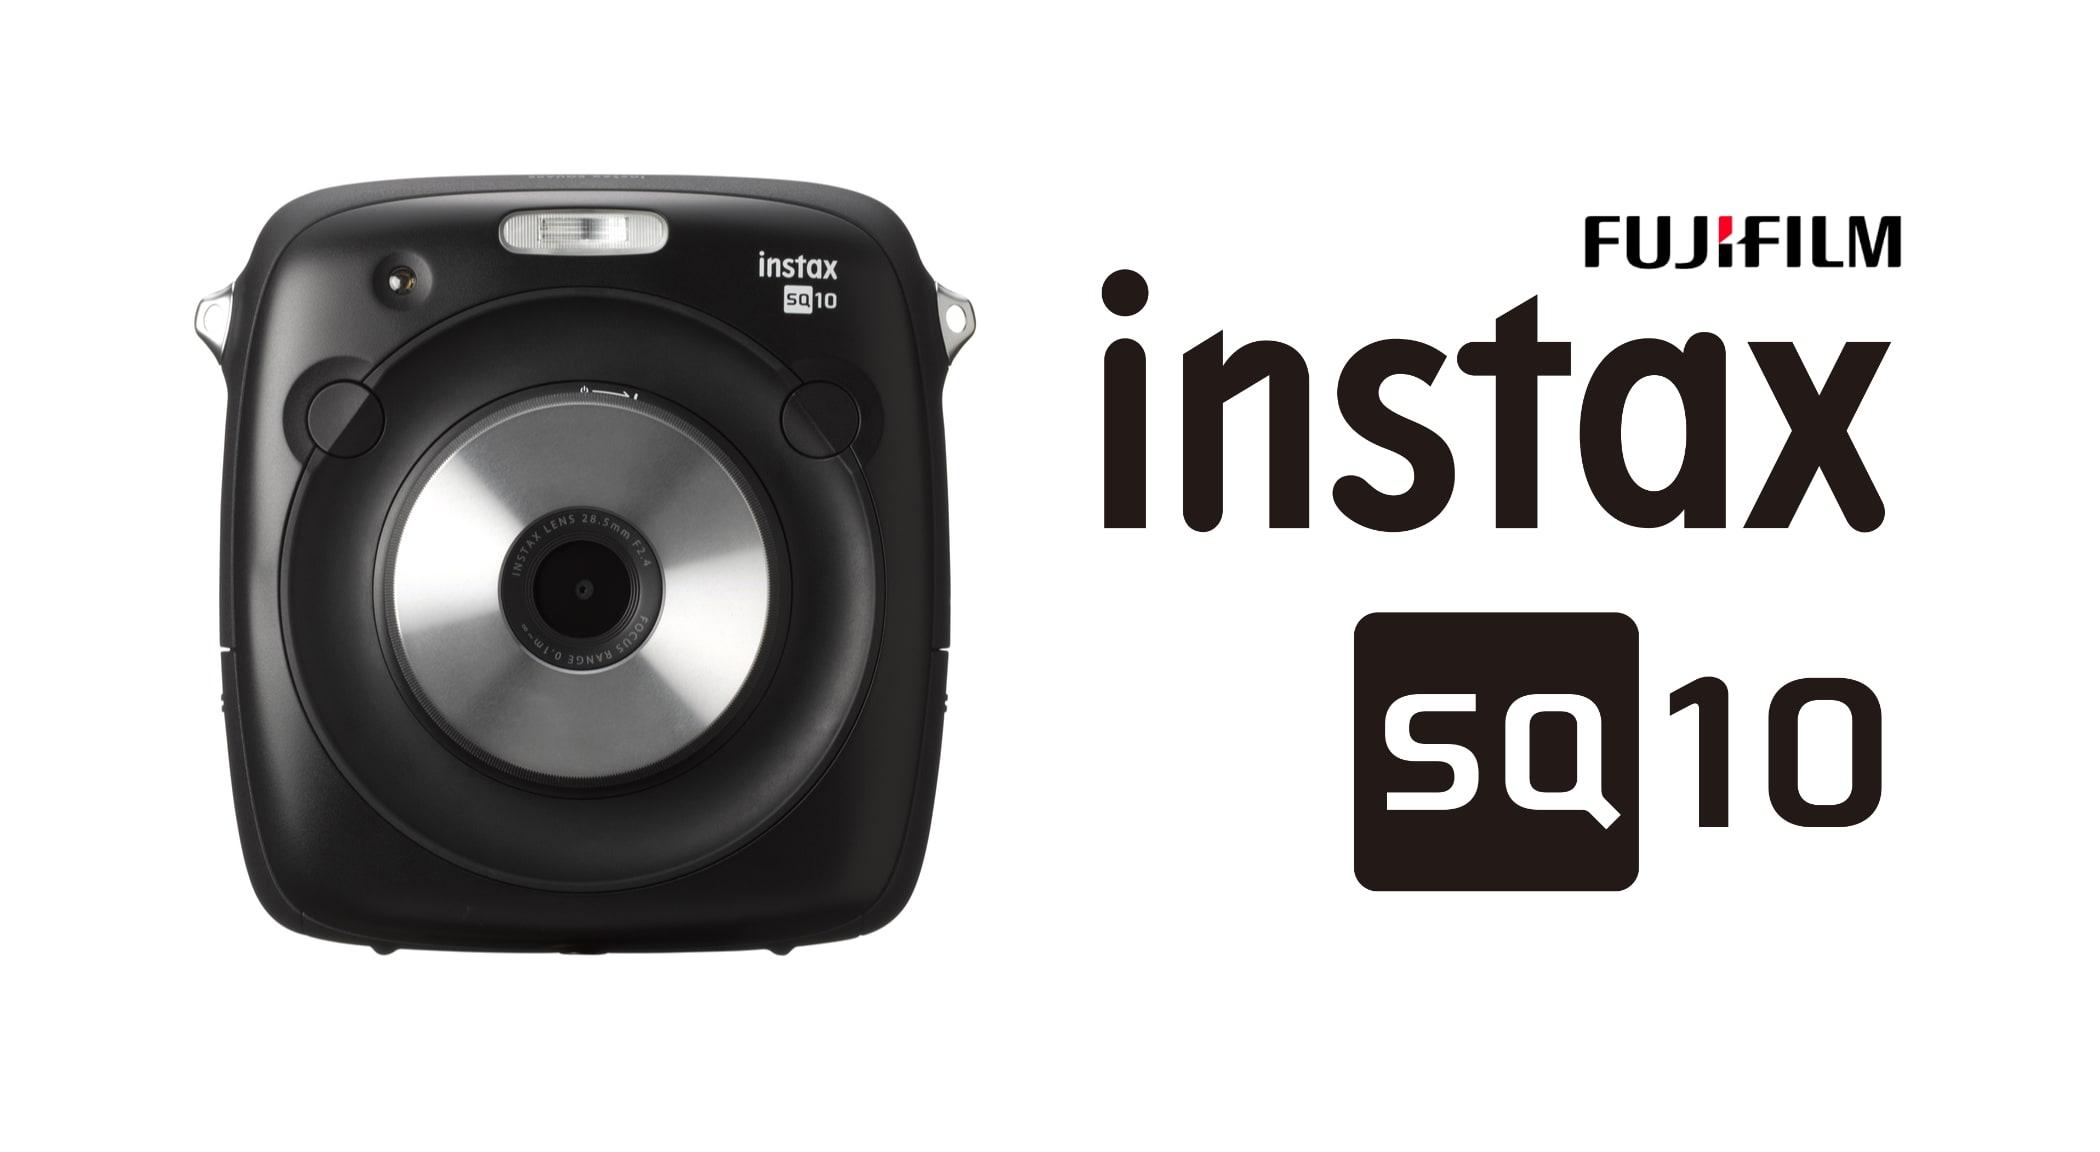 FujiFIlm instax SQUARE SQ10 front black